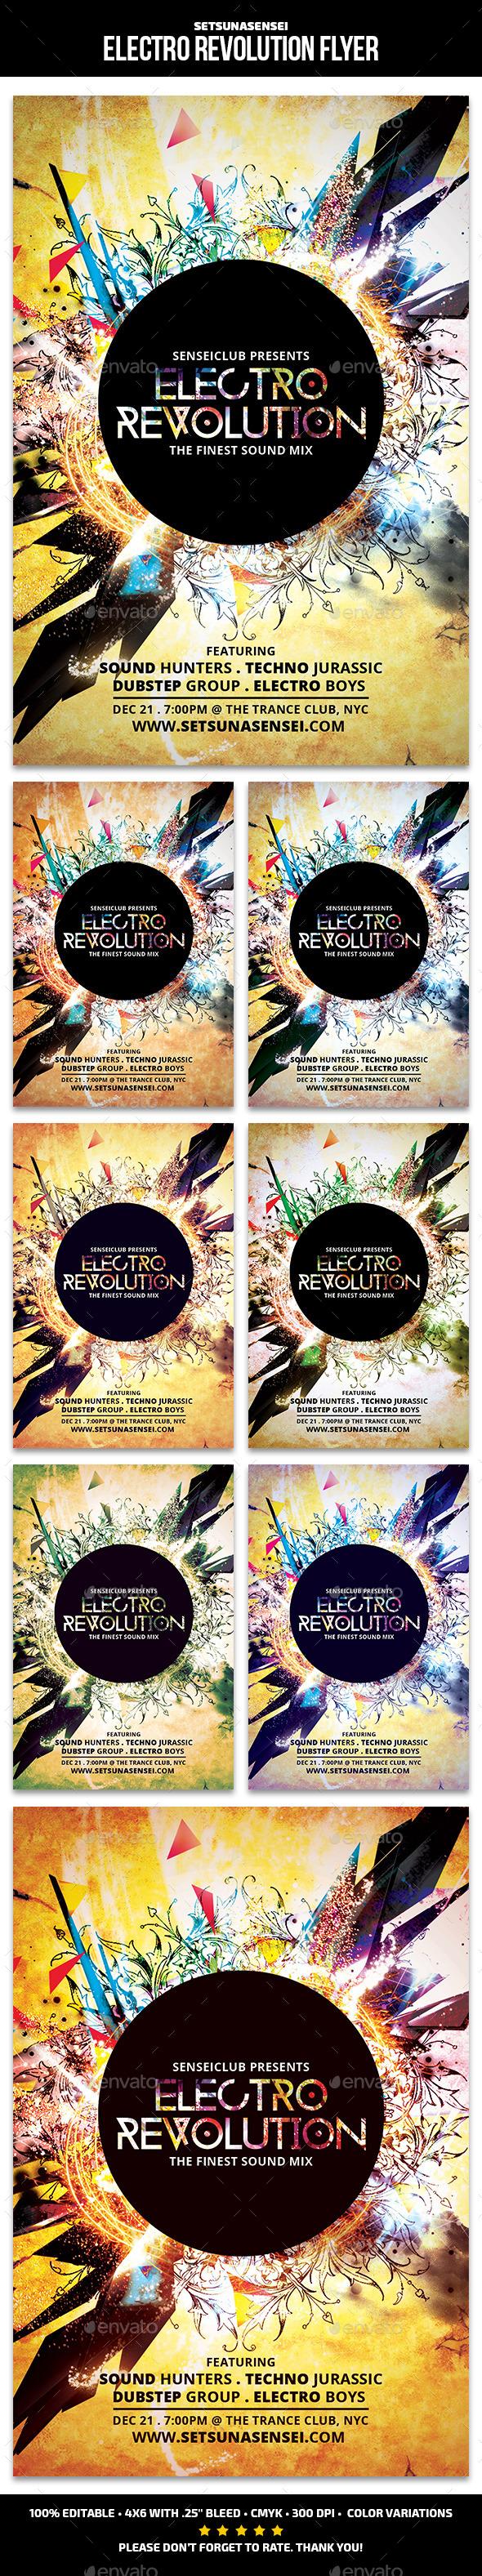 GraphicRiver Electro Revolution Flyer 11774798